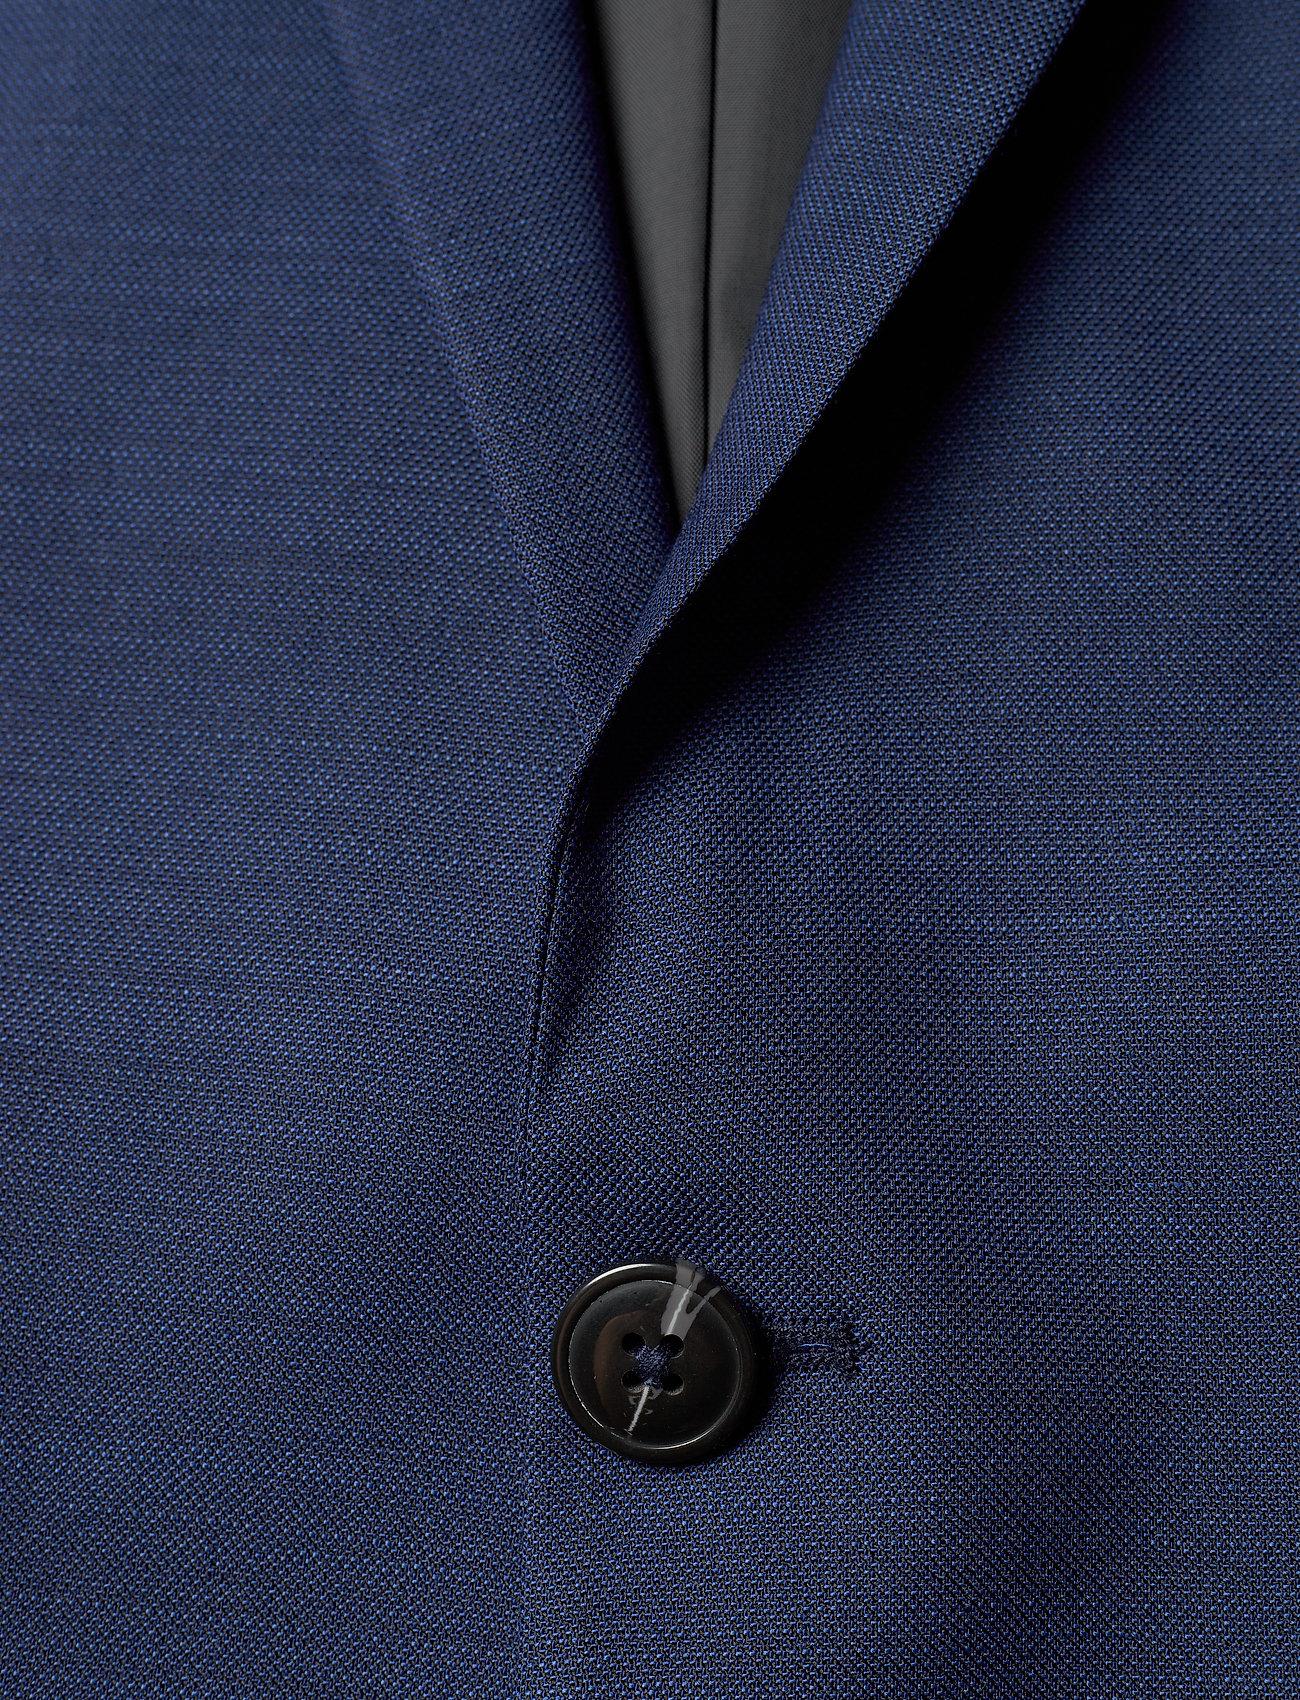 Jack & Jones JPRSOLARIS SUIT - Dresser & blazere MEDIEVAL BLUE - Menn Klær